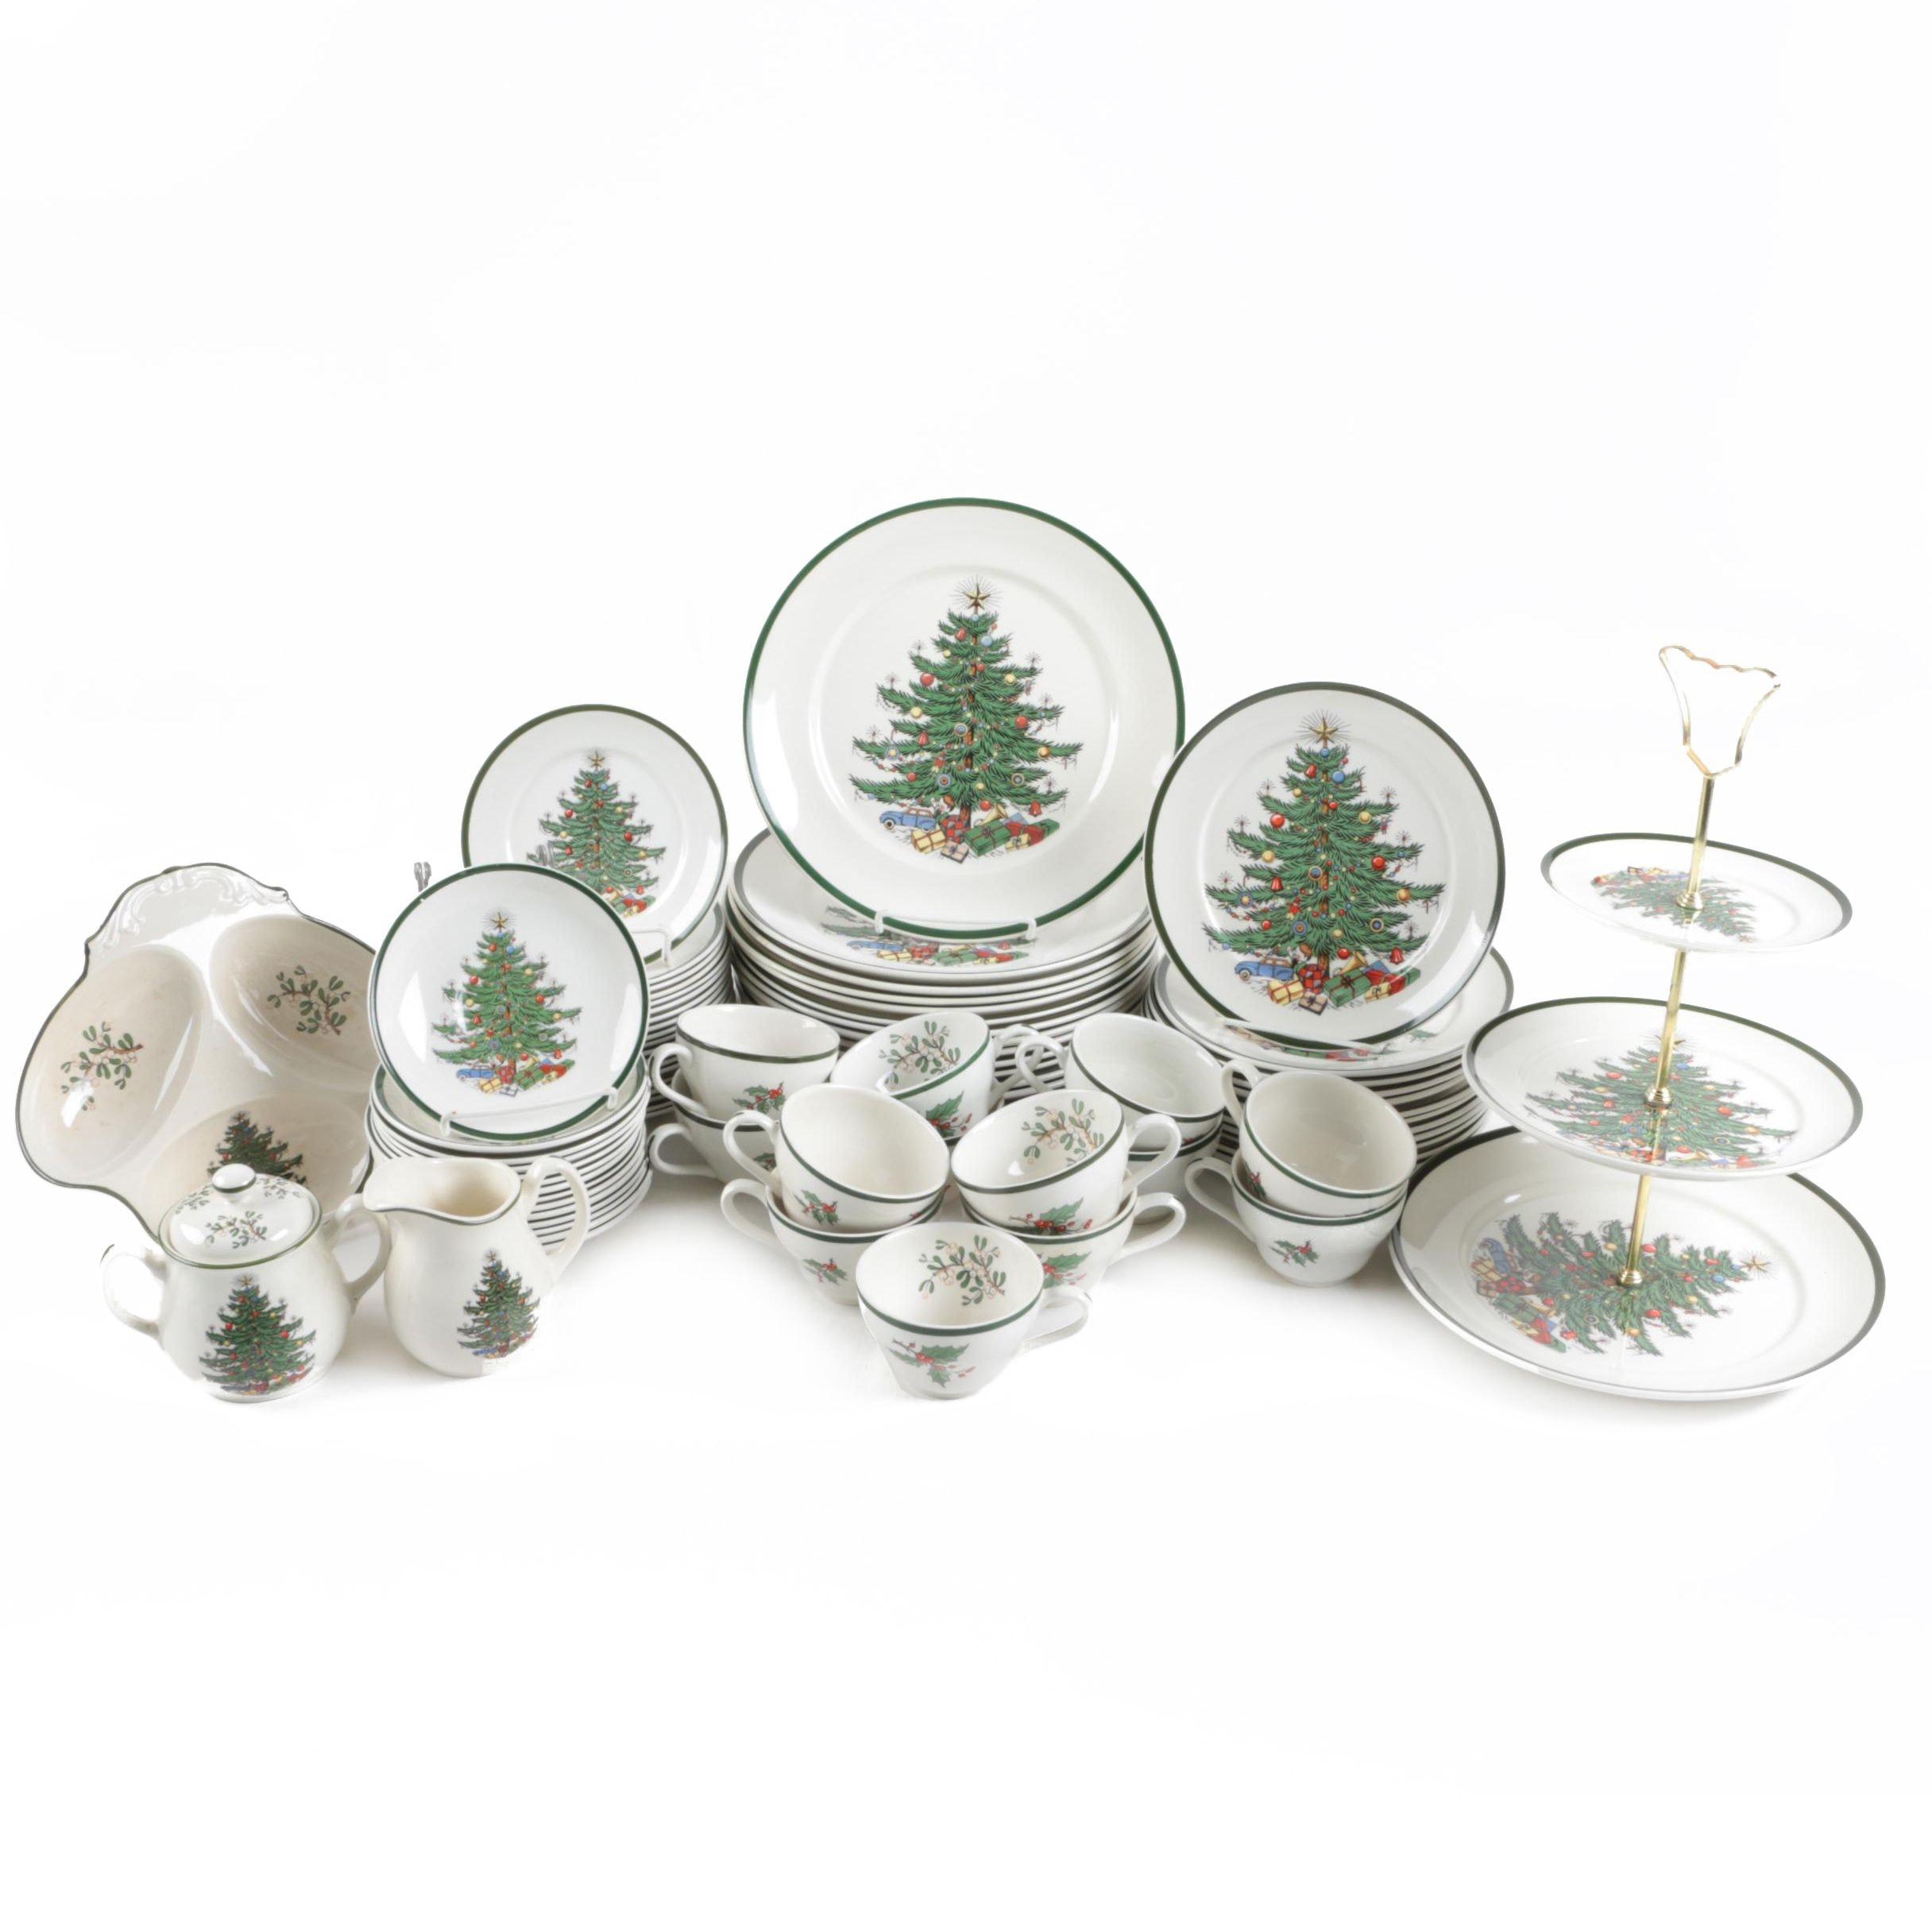 Christmas Themed Ceramic Tableware